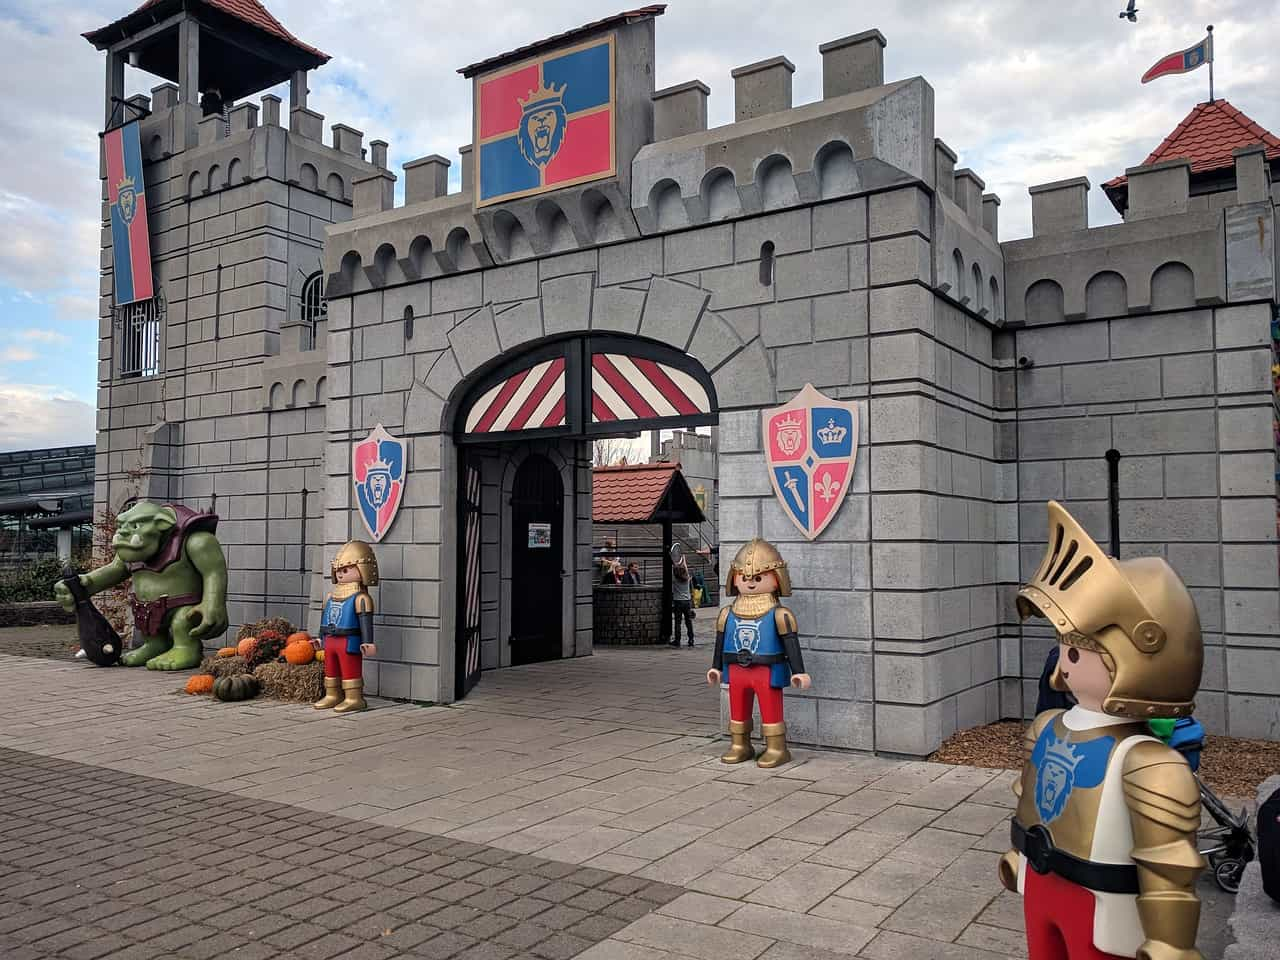 Playmobil Funpark 32% Billiger - Familie nur 122,00€ Tickets & Hotel